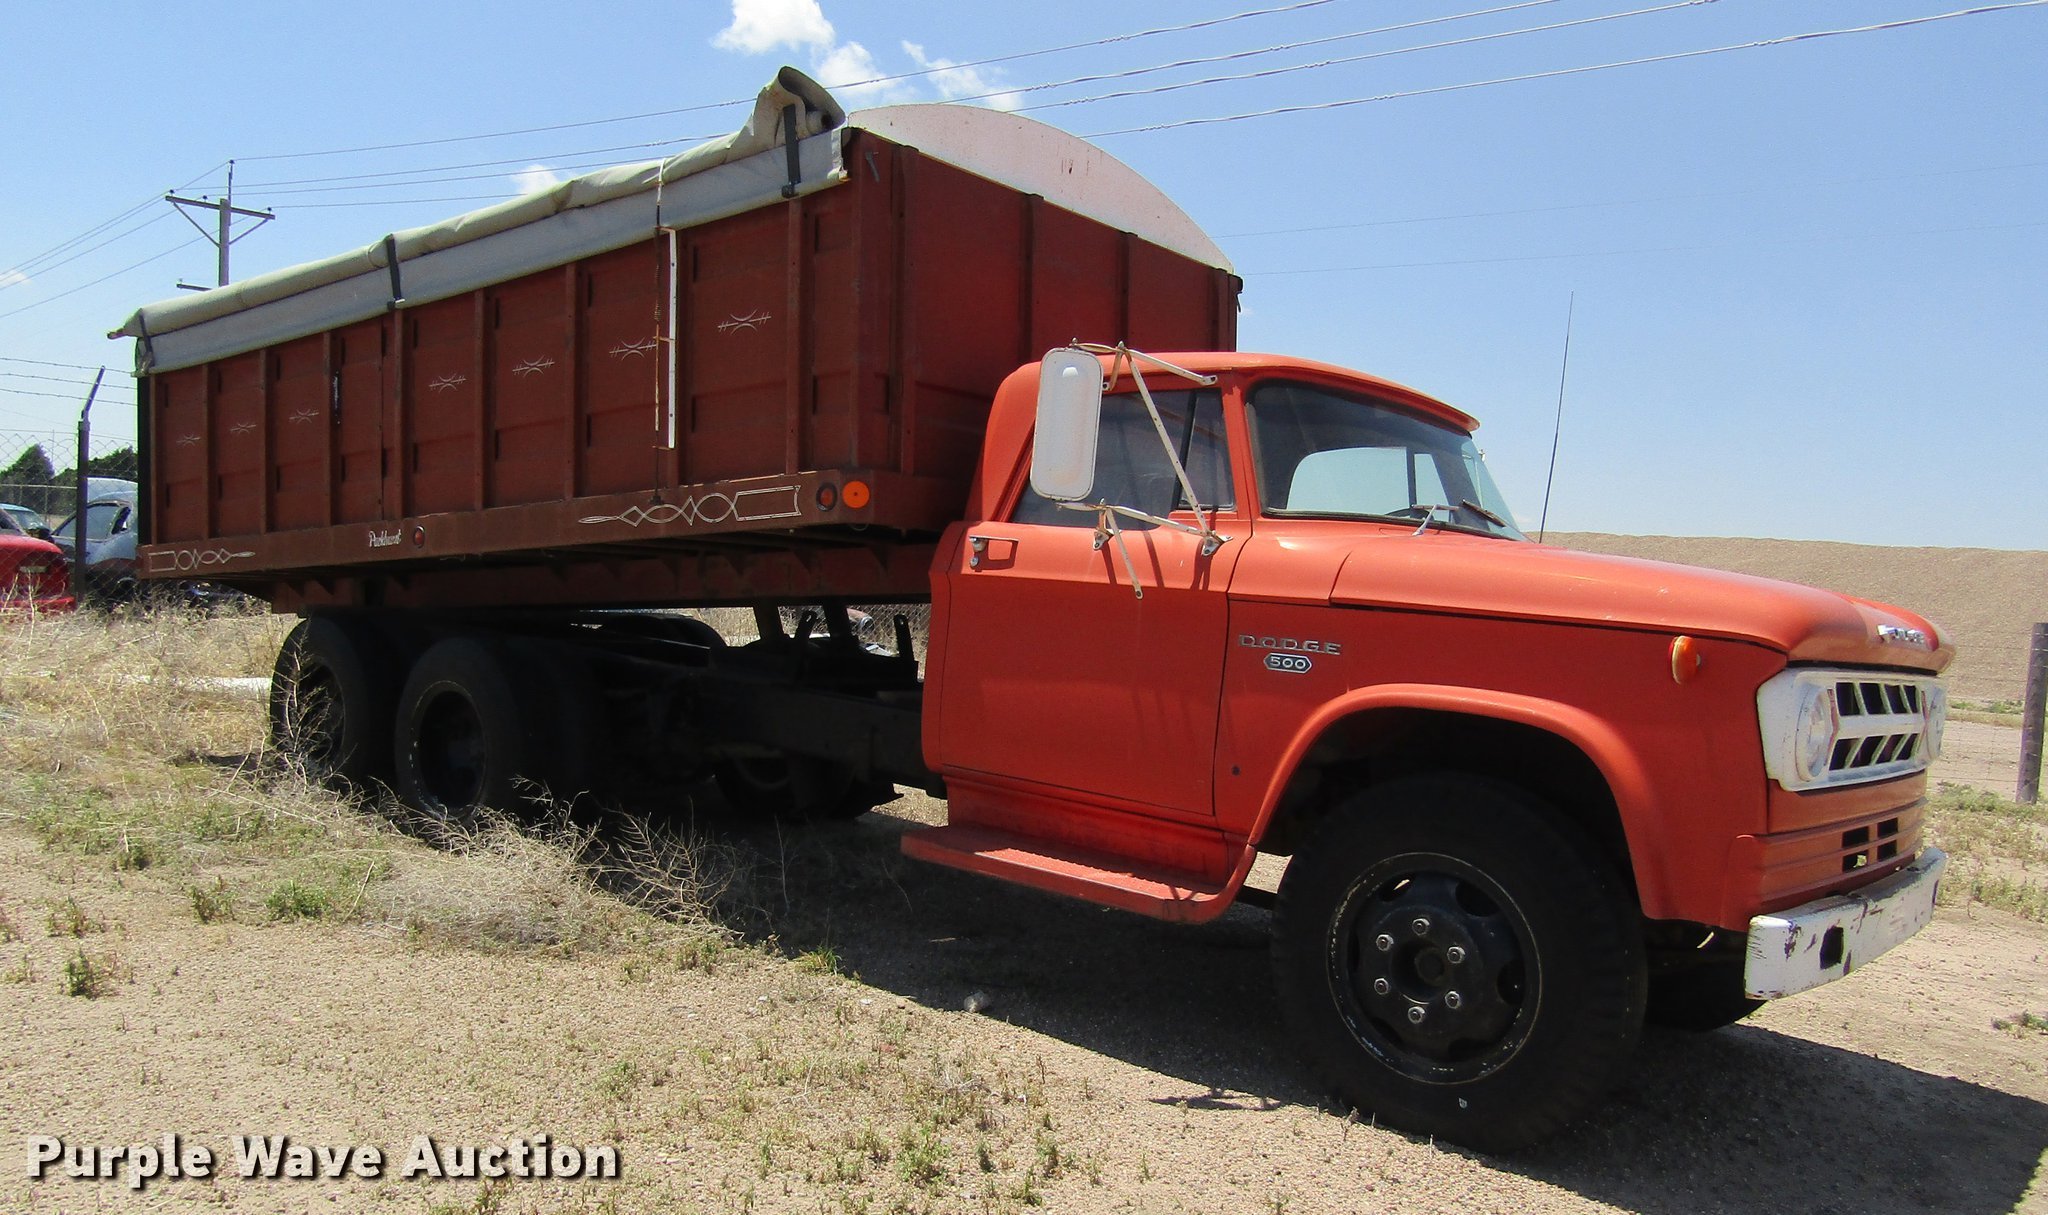 1968 Dodge 500 Grain Truck Item Dd8849 Sold August 8 Ag Pick Up Image For